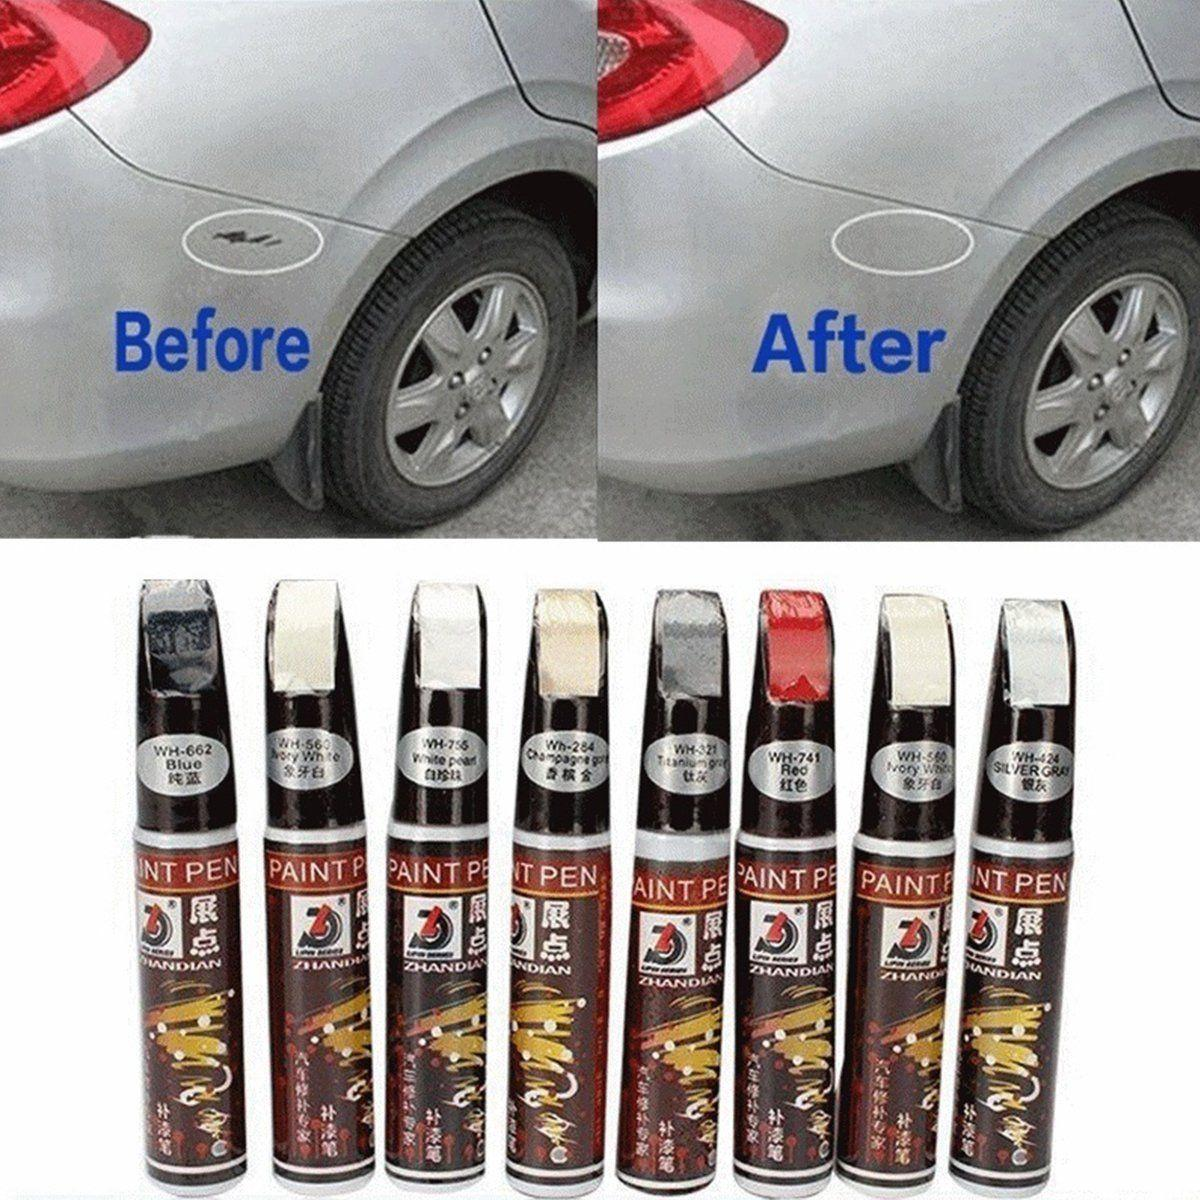 Car Coat Repair Paint Pen Auto Car Repair Pen Coat Touch Up Scratch Cover Remove Repair Fix Clear Painting Pen Ffa112 Detailing A Car Detailing